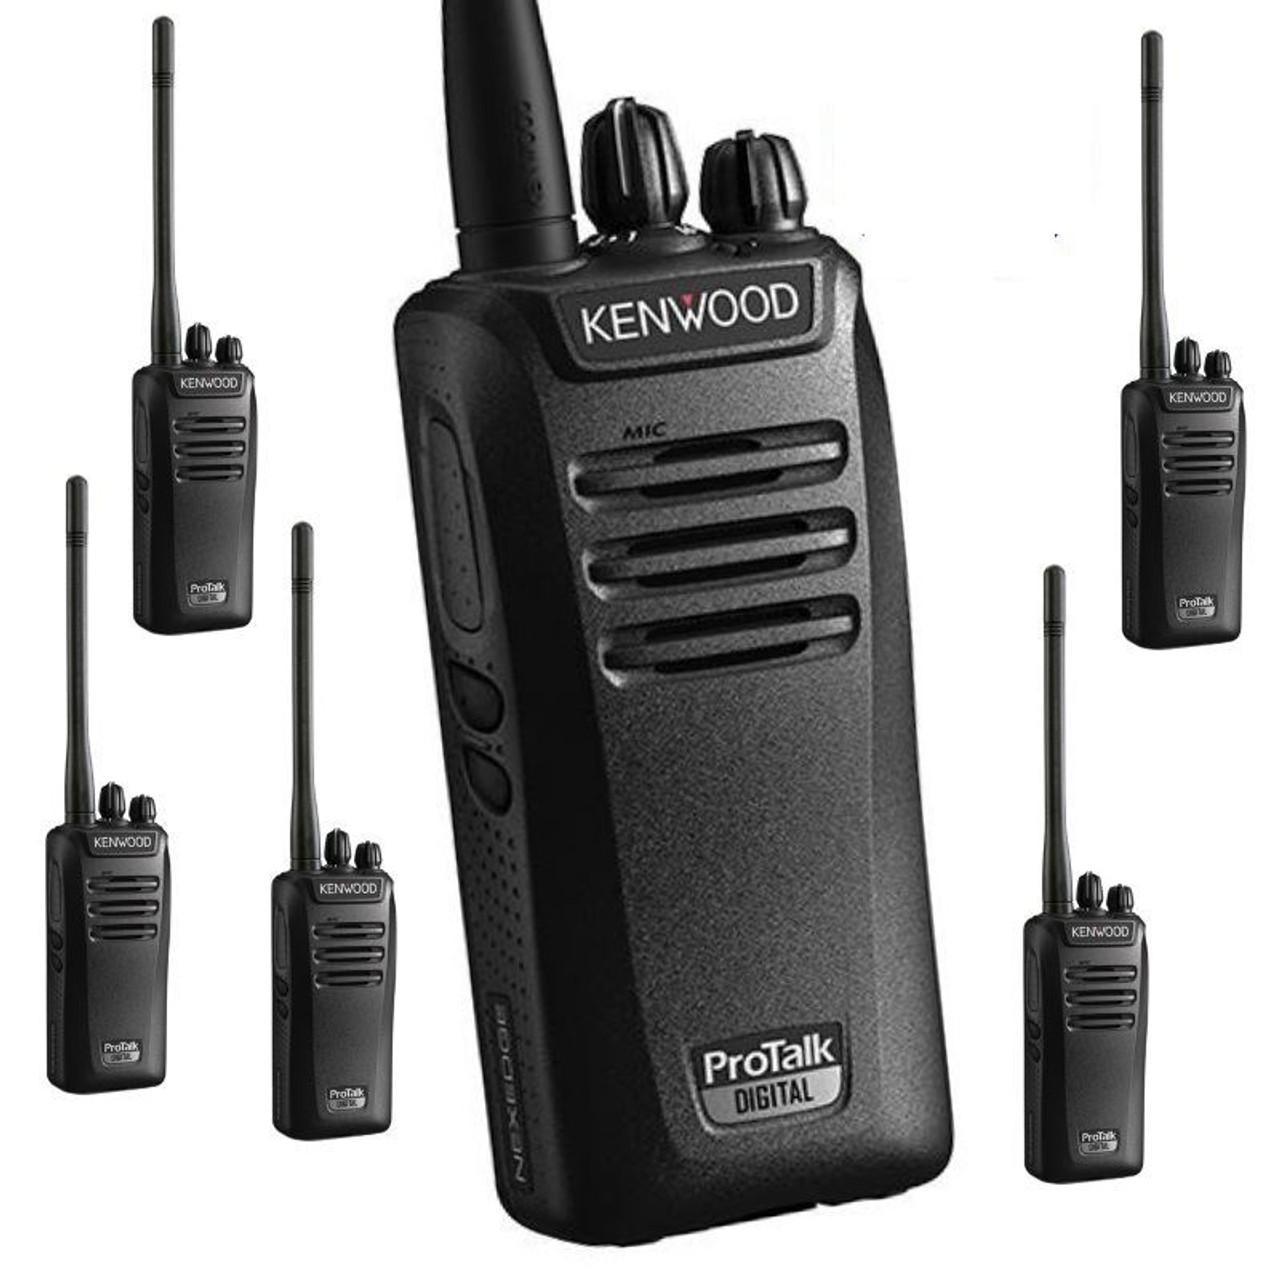 Kenwood NX 240 Digital Analog 32CH 2W VHF Radio Six Pack